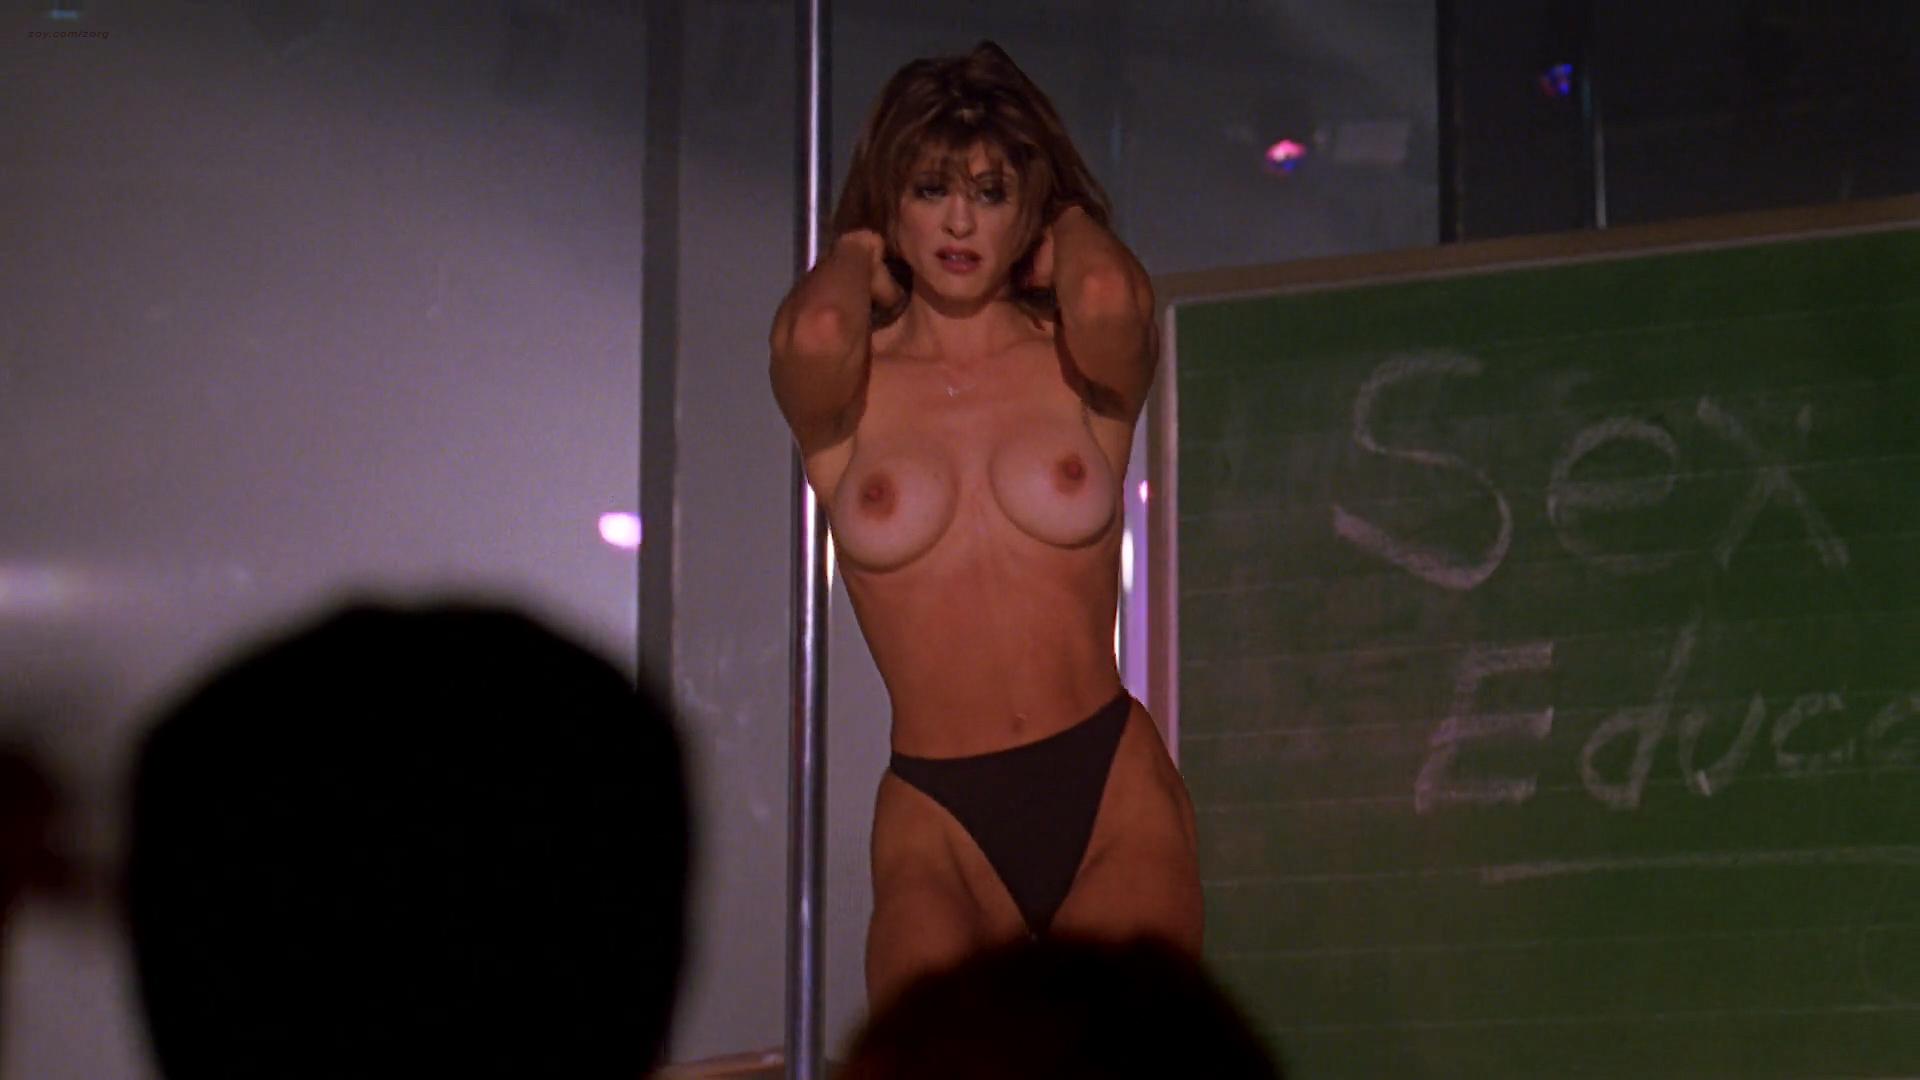 Teen ali larter nude sex scene video hot booty